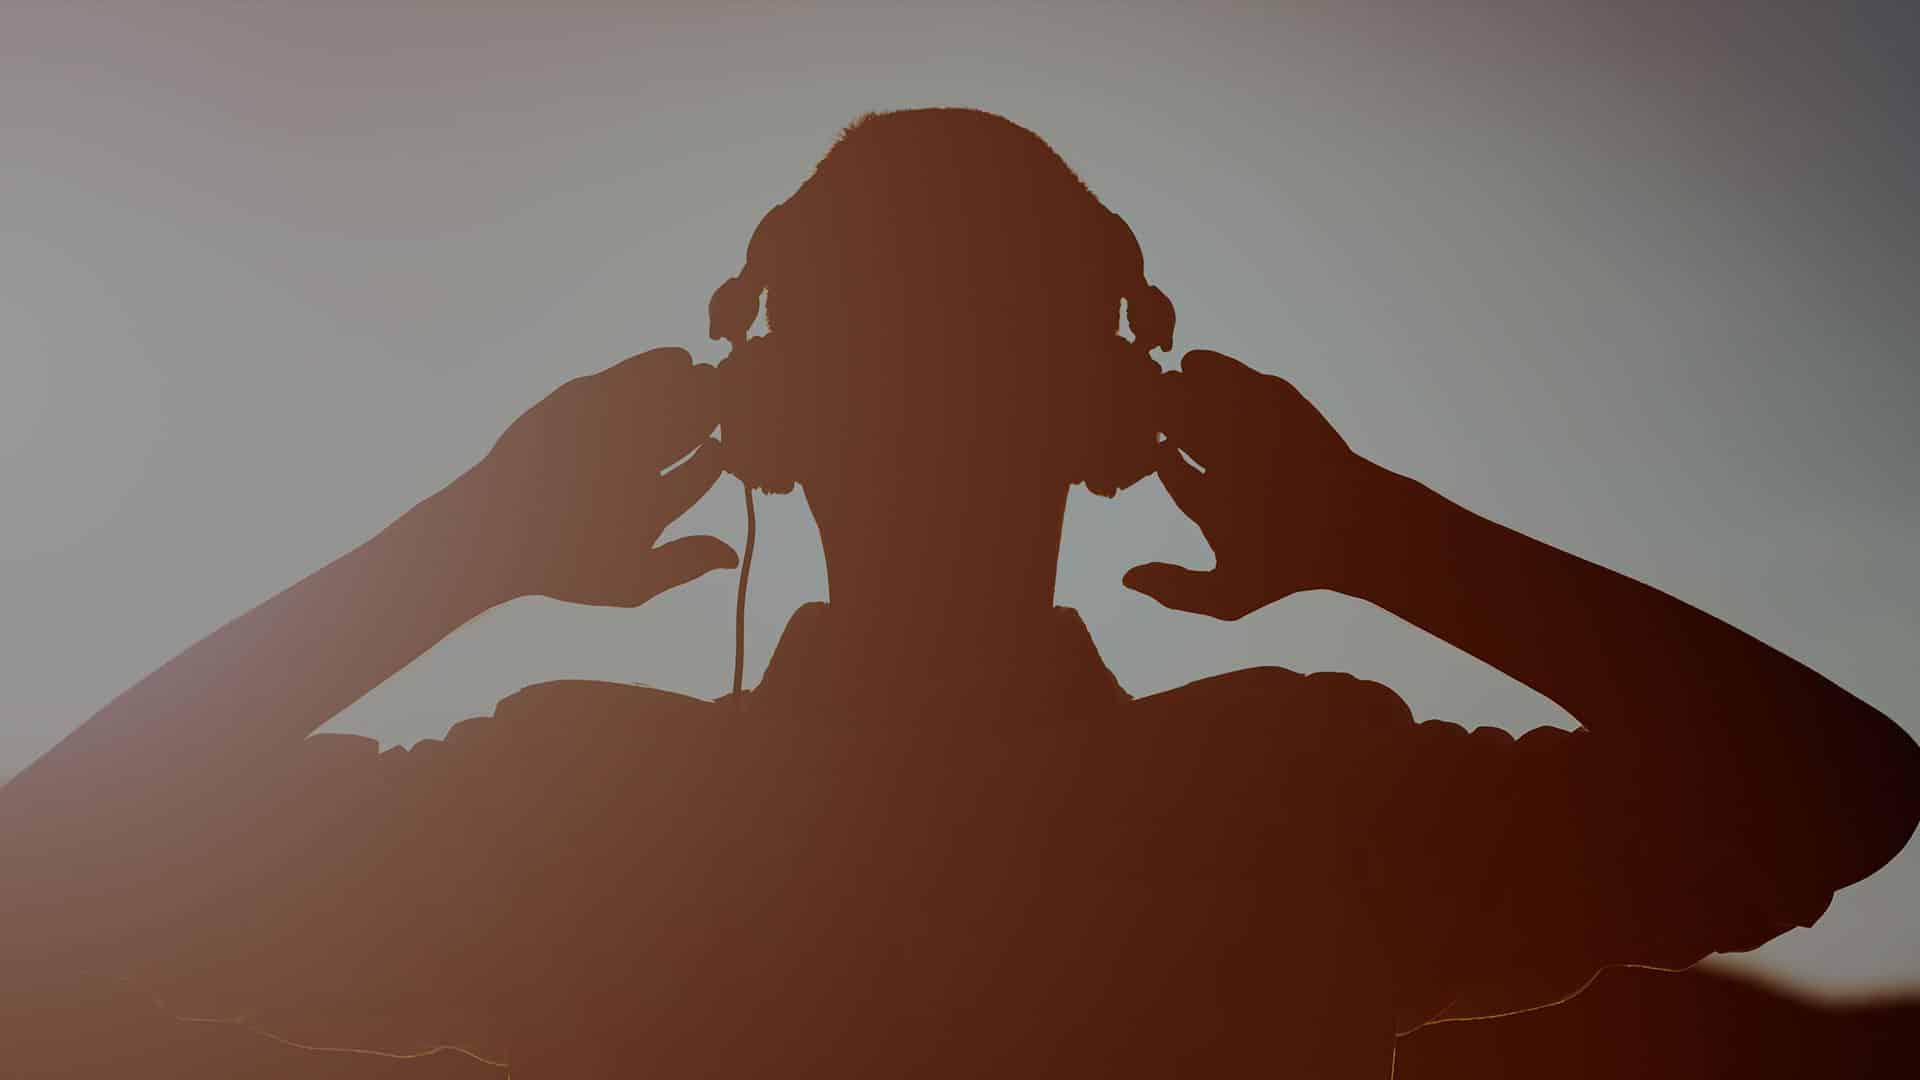 Career: Listening